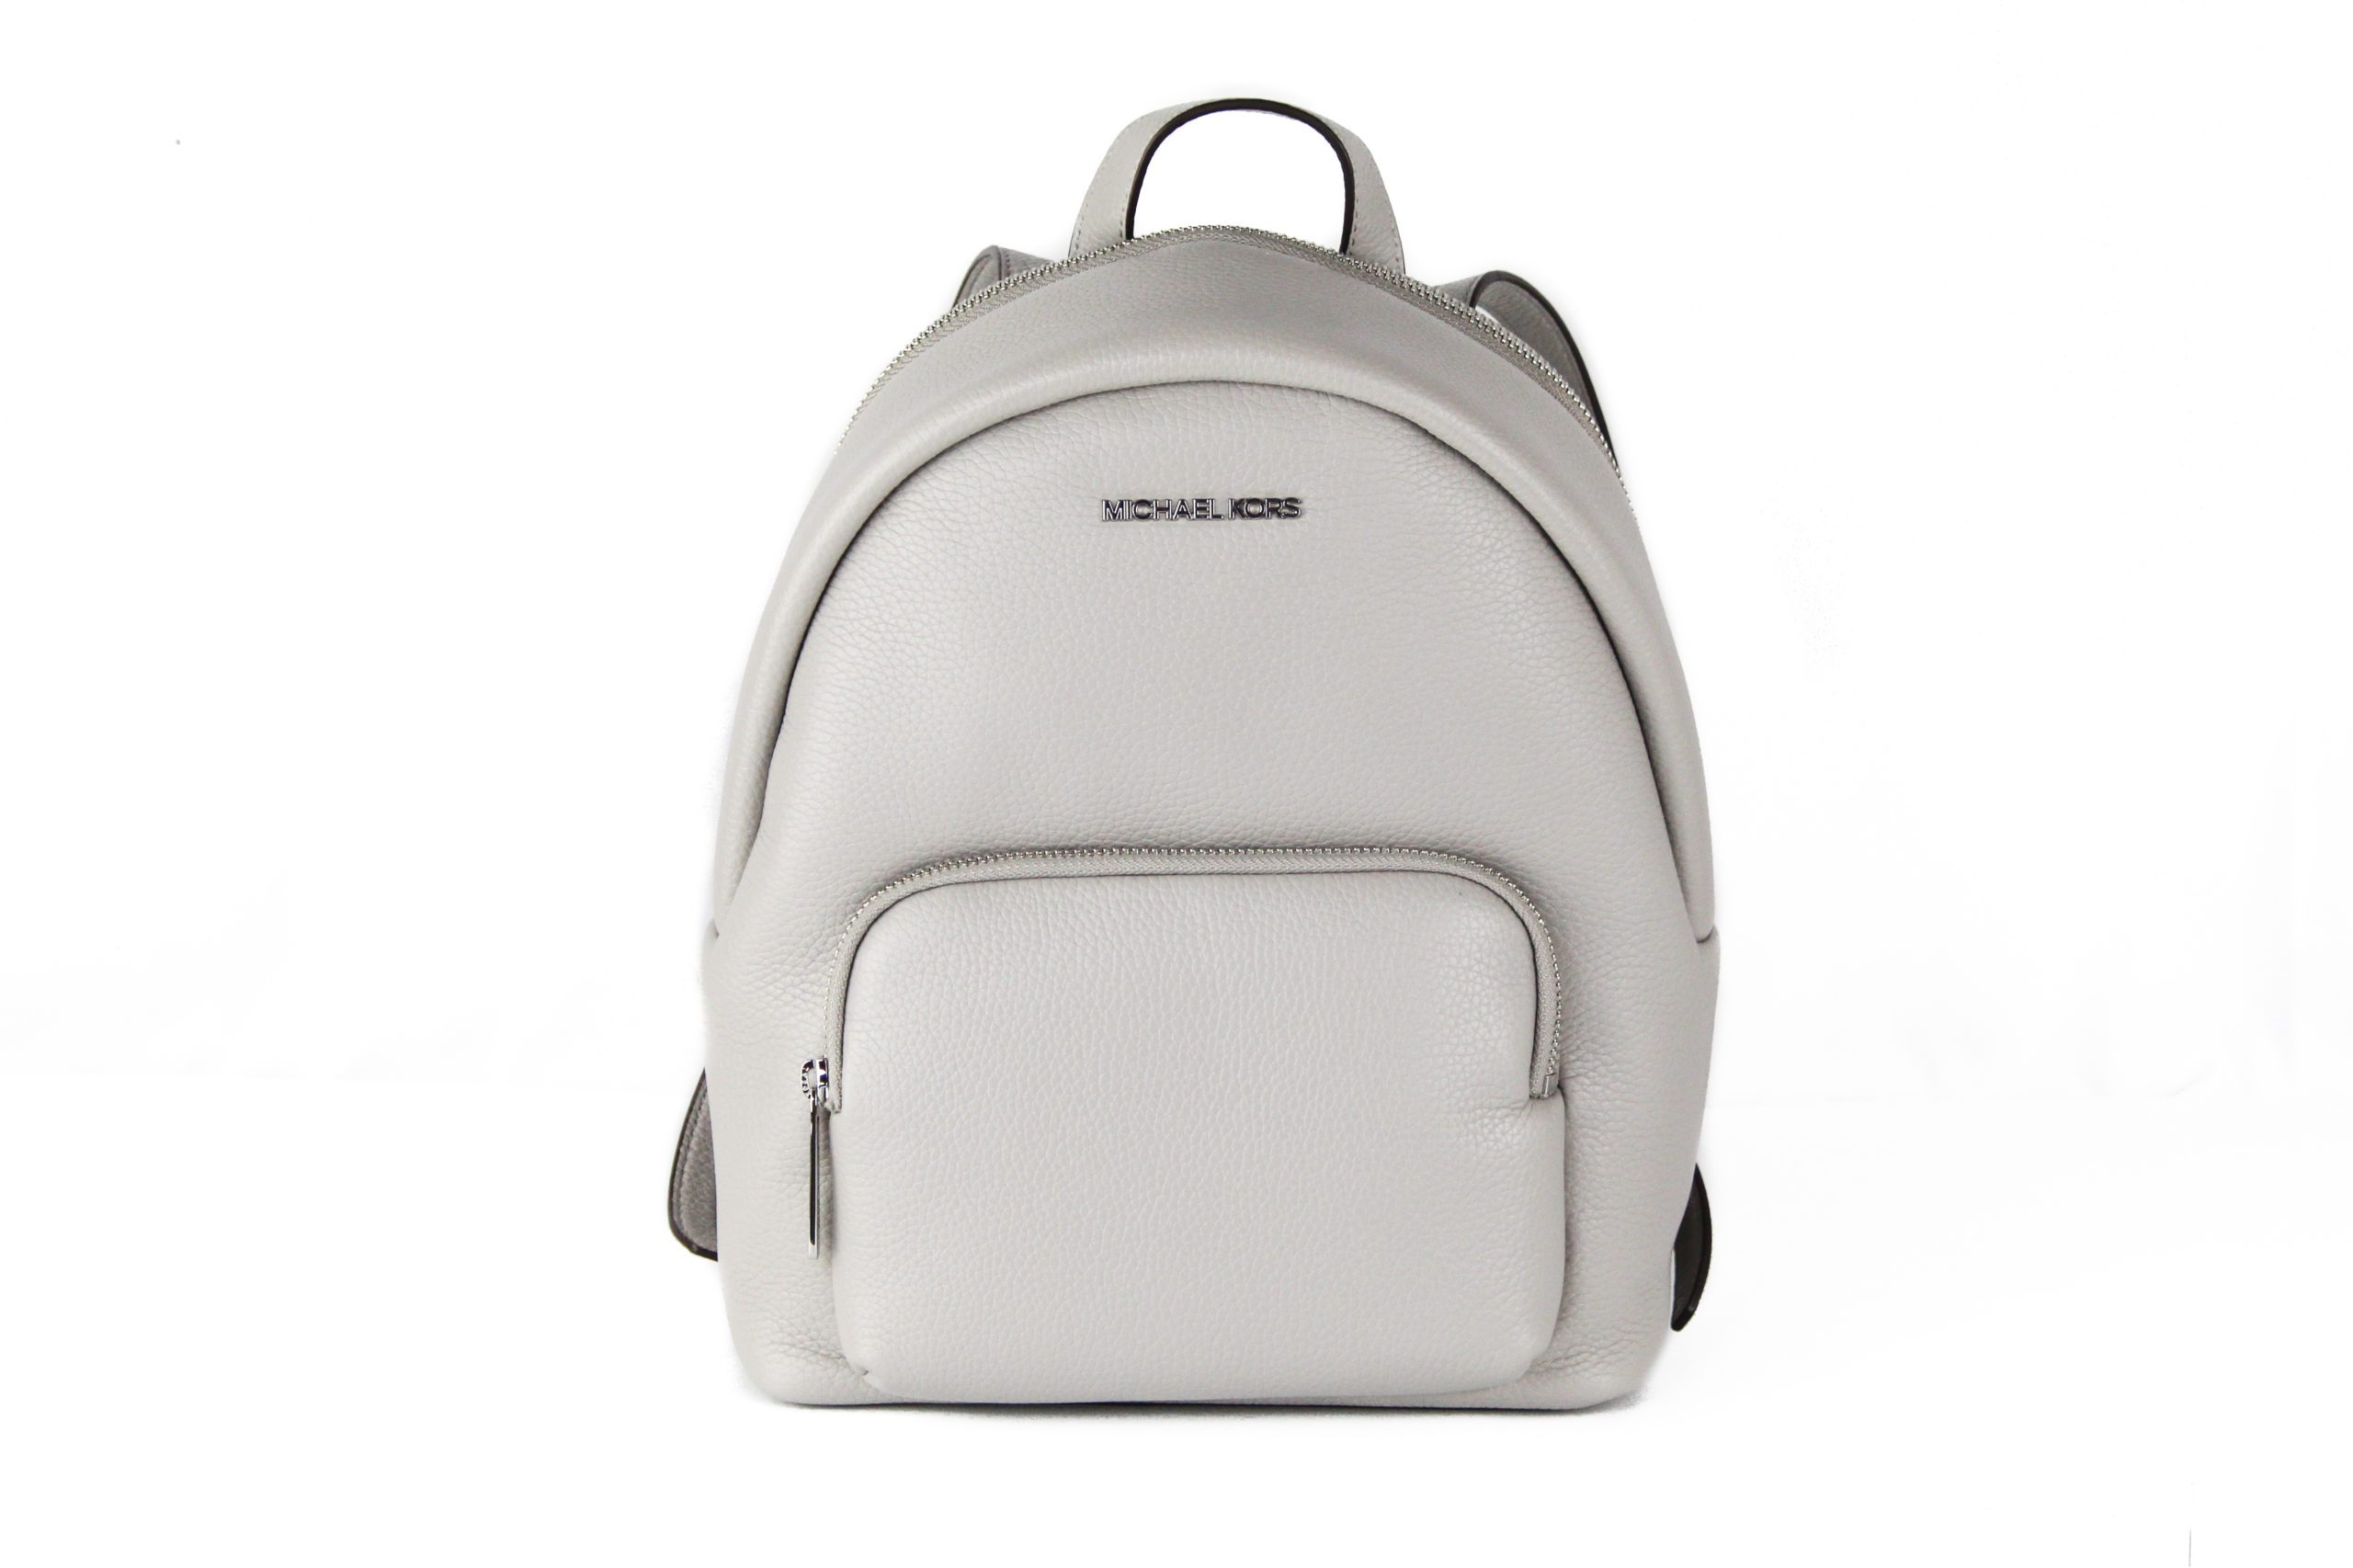 Michael Kors Women's Erin Backpack Grey 81846